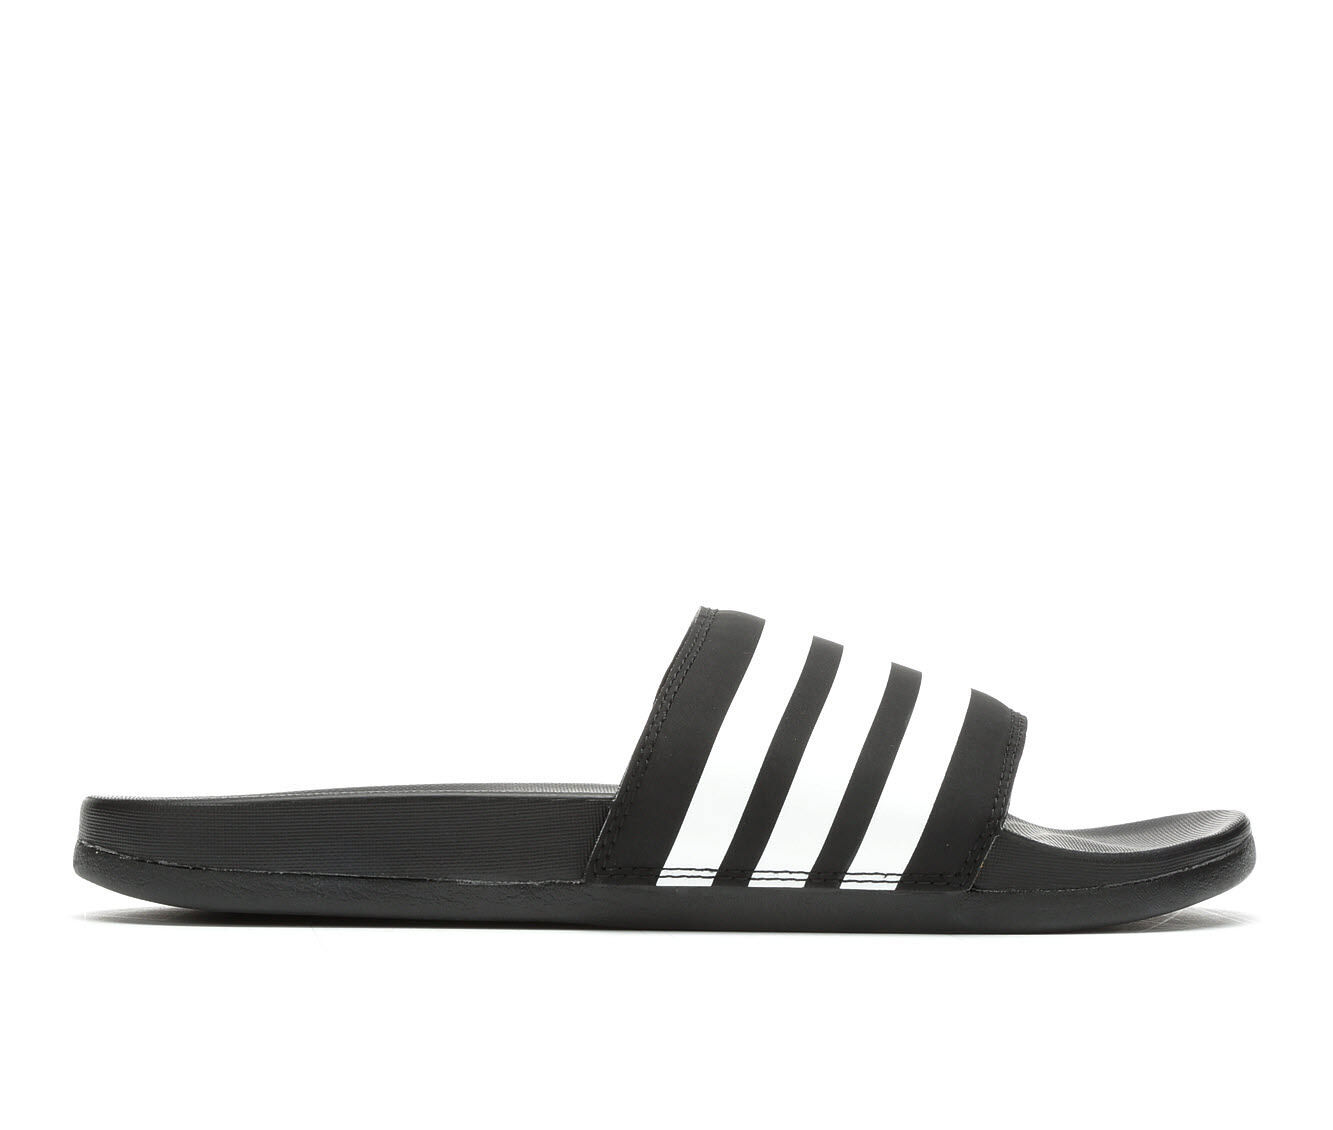 cheap exclusive cheap sale low cost Women's Adidas Adilette CF Stripes Sport Slides for sale cheap price clearance footlocker cheap marketable rKfXdW1F